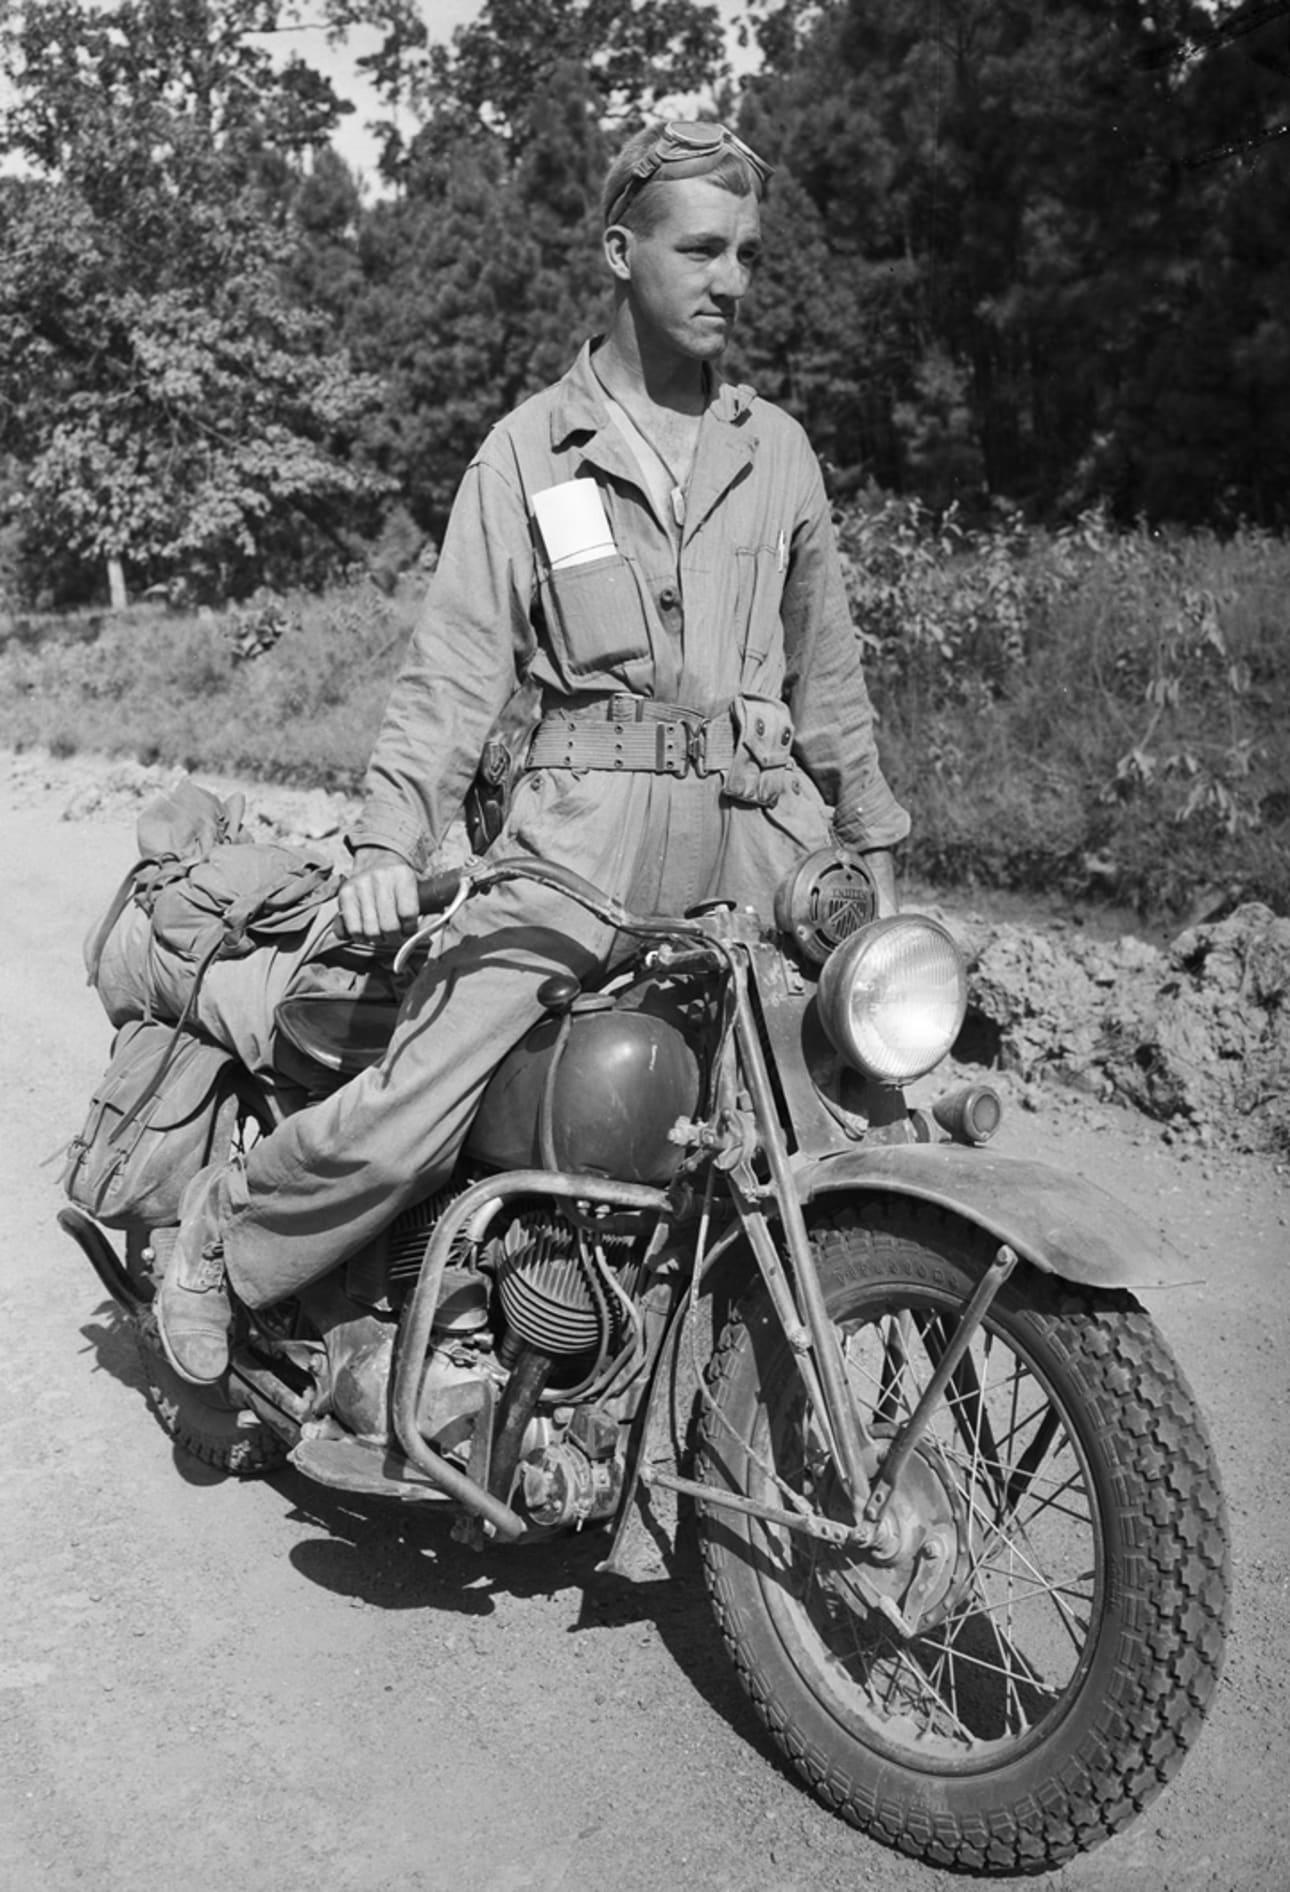 1. Military Vehicles Smaller than Quarter Ton (bikes, motorcycles, hand carts, etc.)